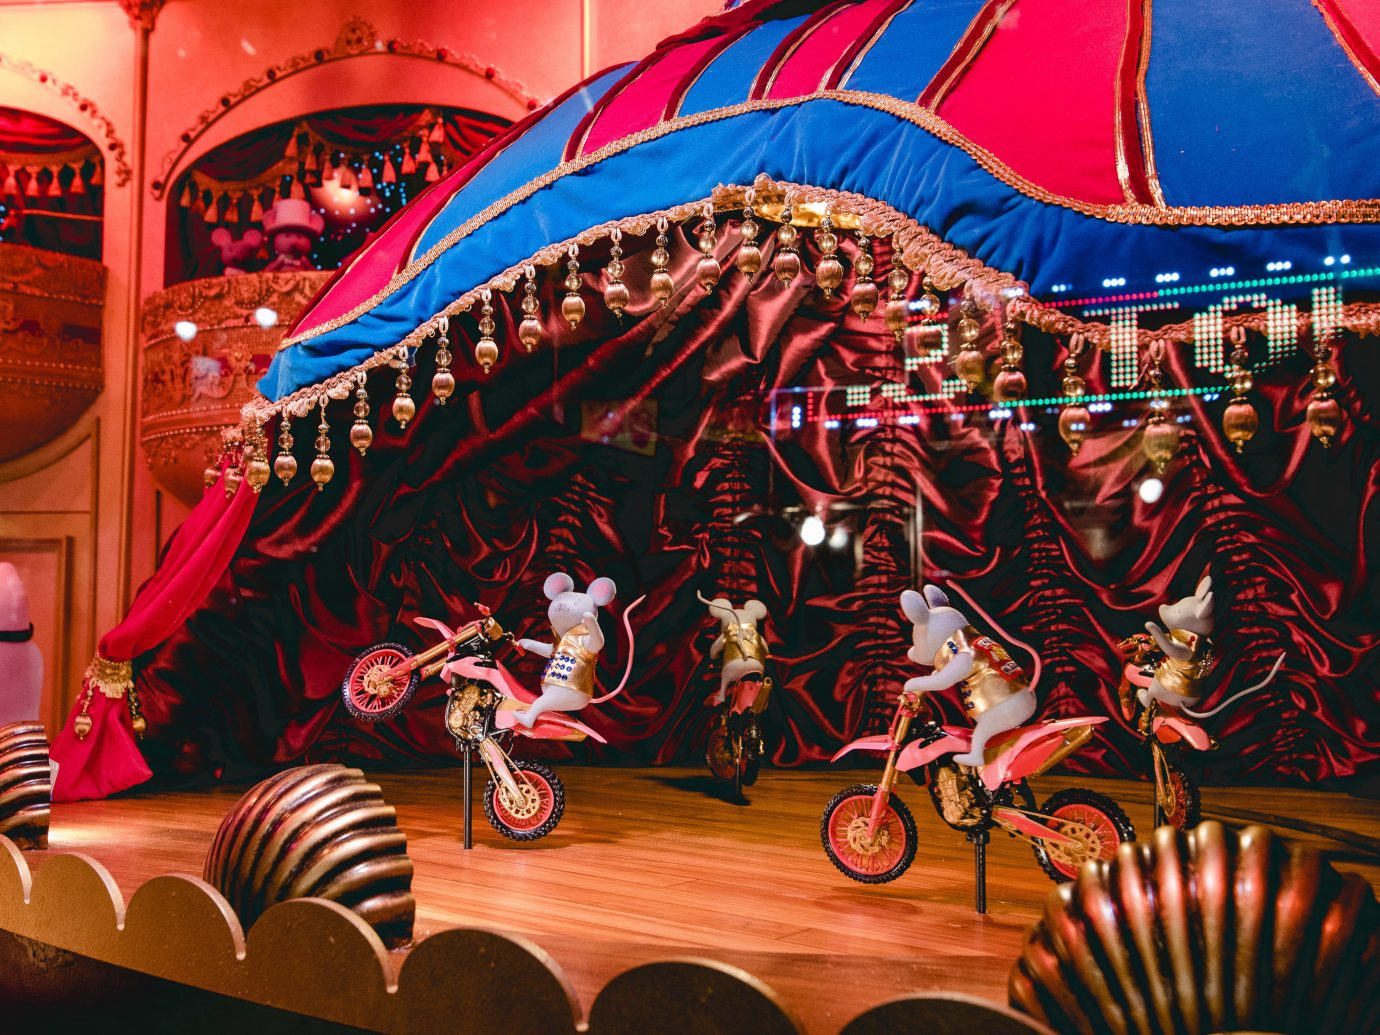 Offbeat Winter Entertainment amusement ride stage amusement park fair fête art festival circus recreation fun decorated